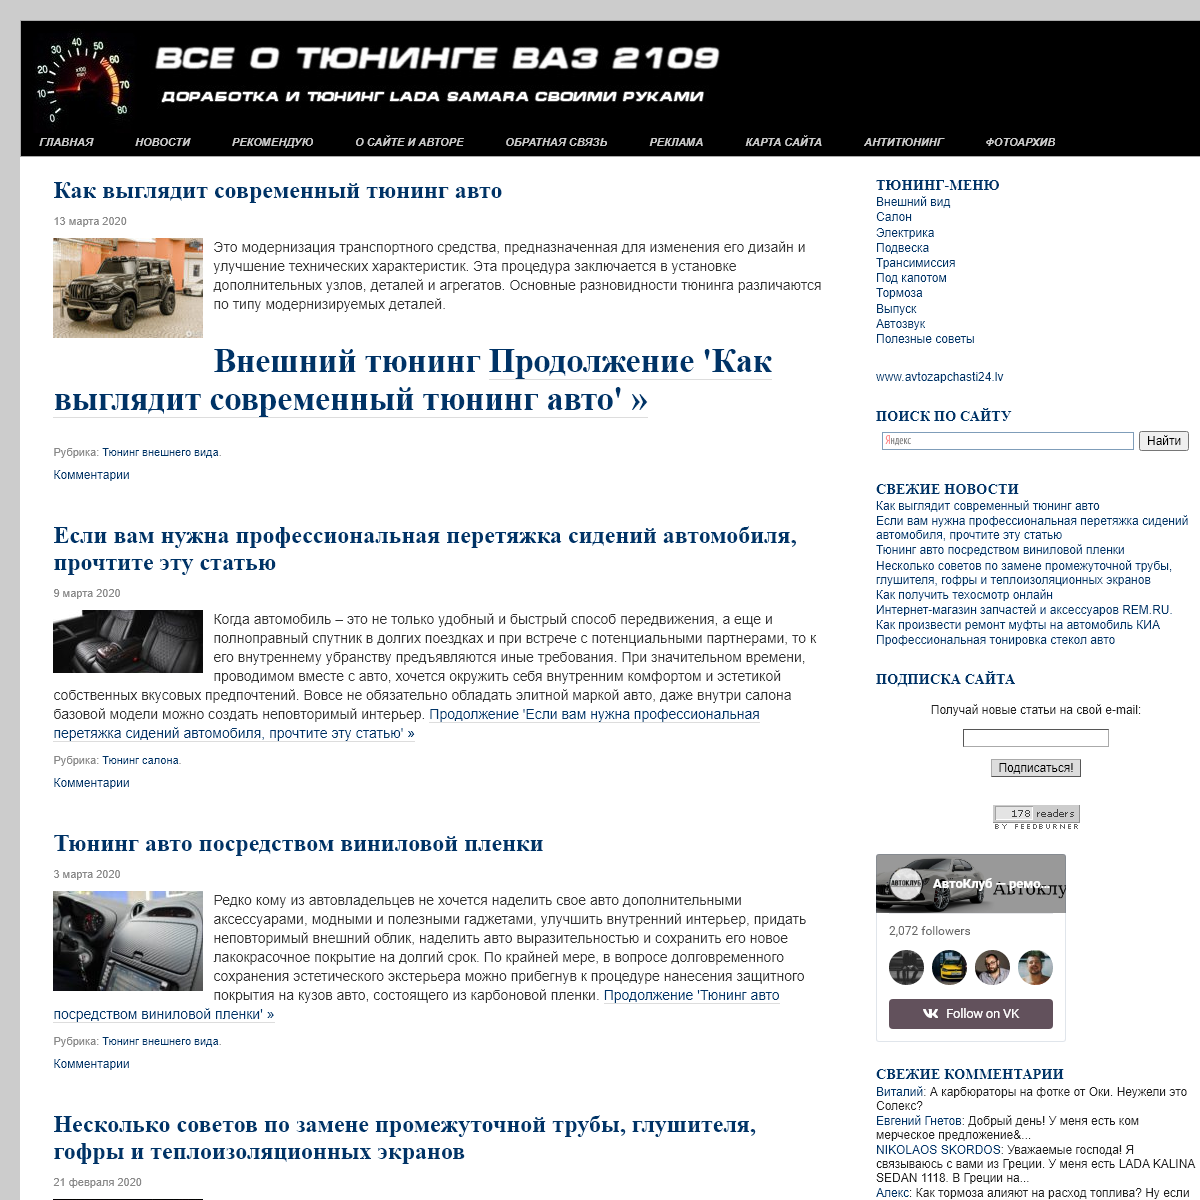 Тюнинг ВАЗ 2109 - Все о тюнинге автомобилей ВАЗ 2109 Лада Самара своими рук